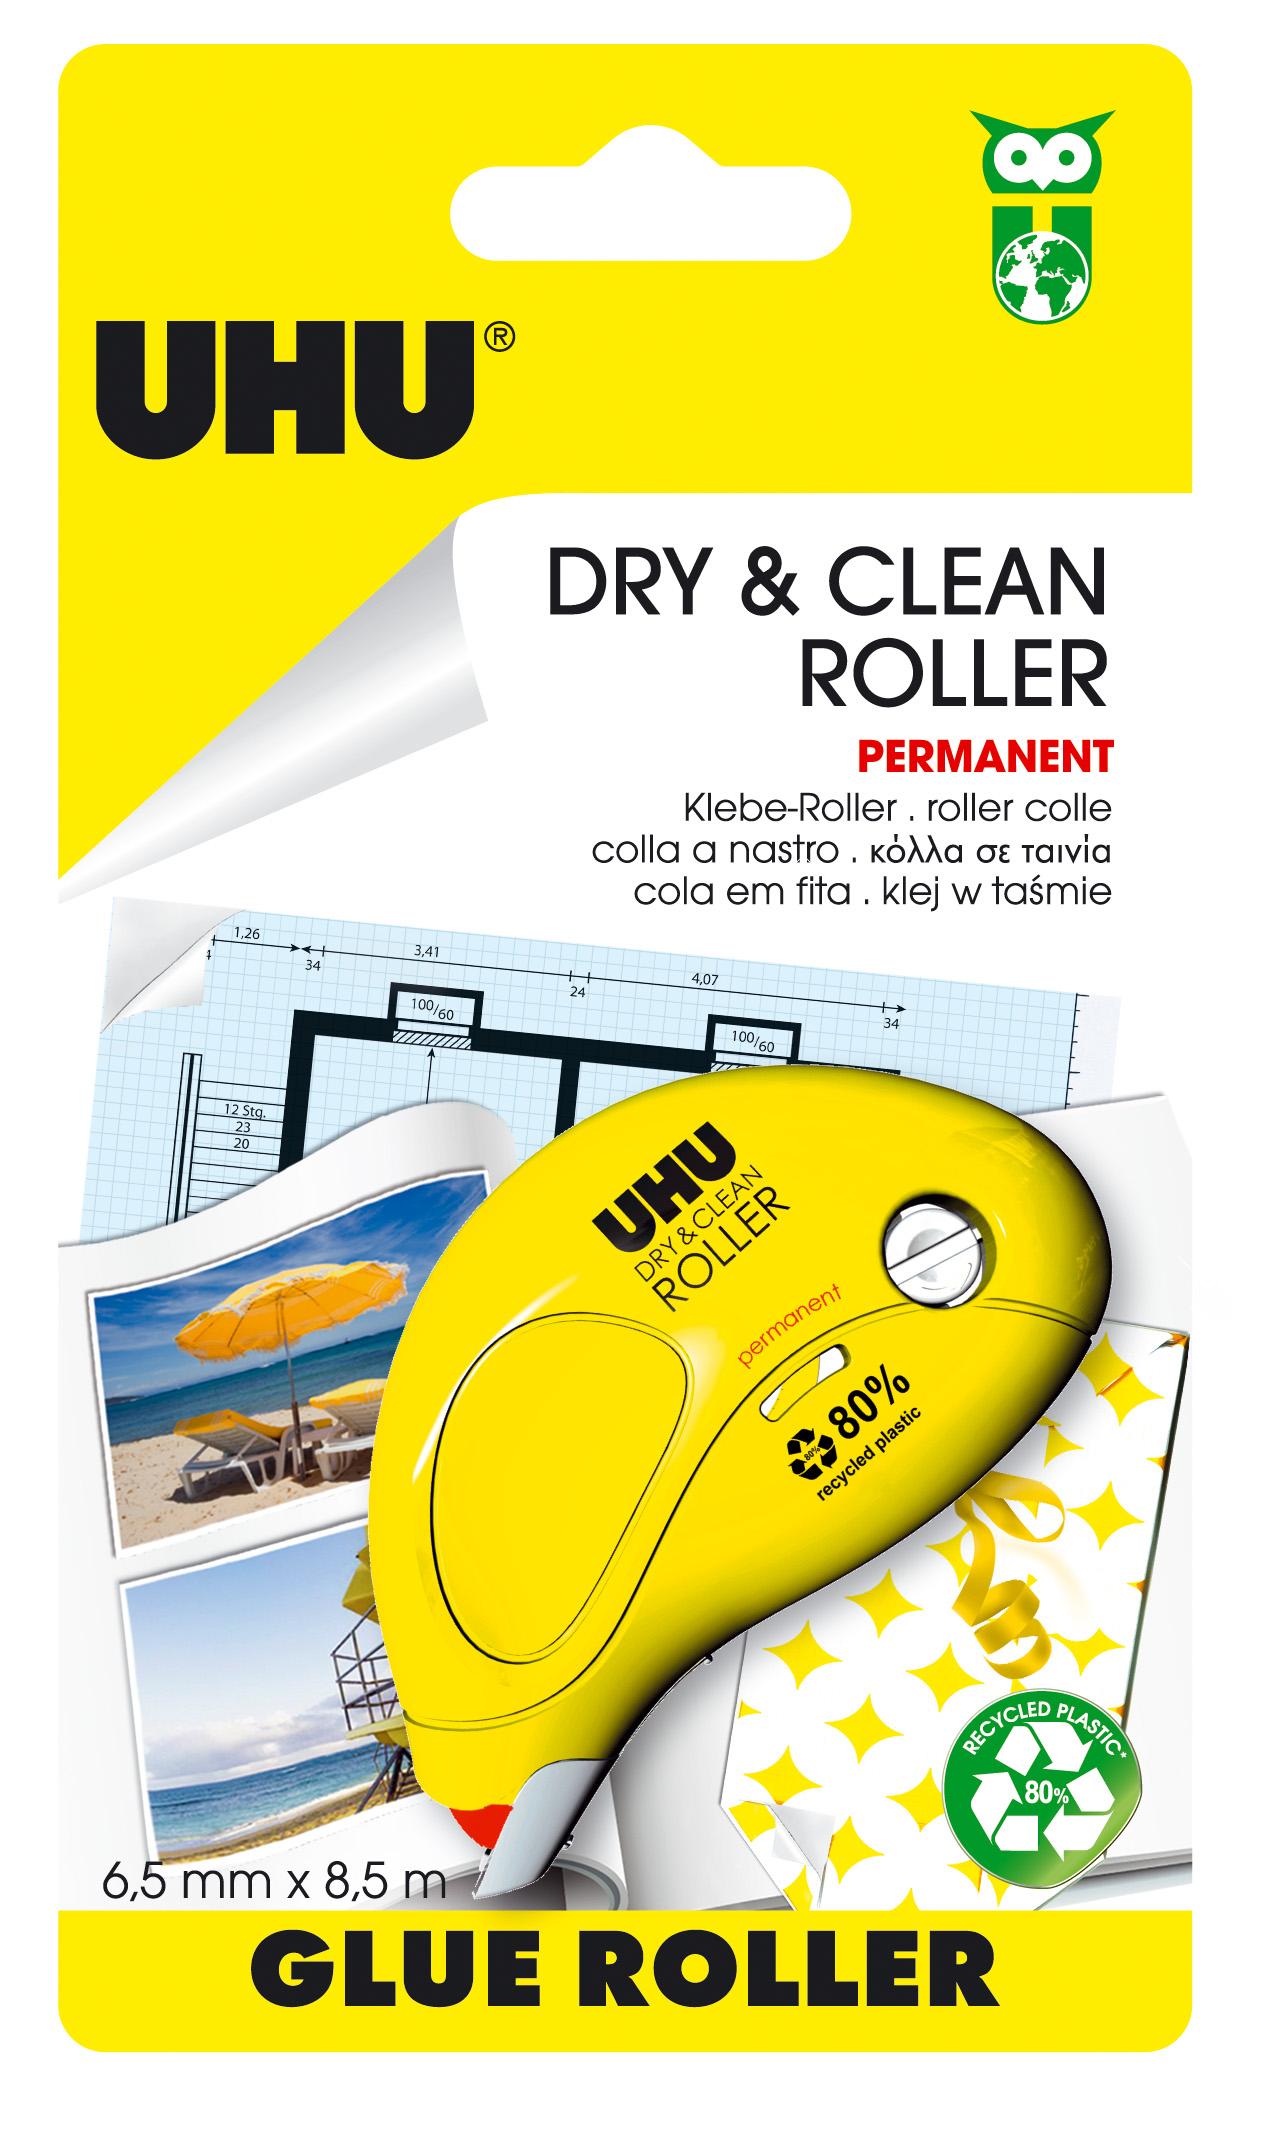 UHU Dry & Clean Roller Kleberoller, permanent, Infokarte